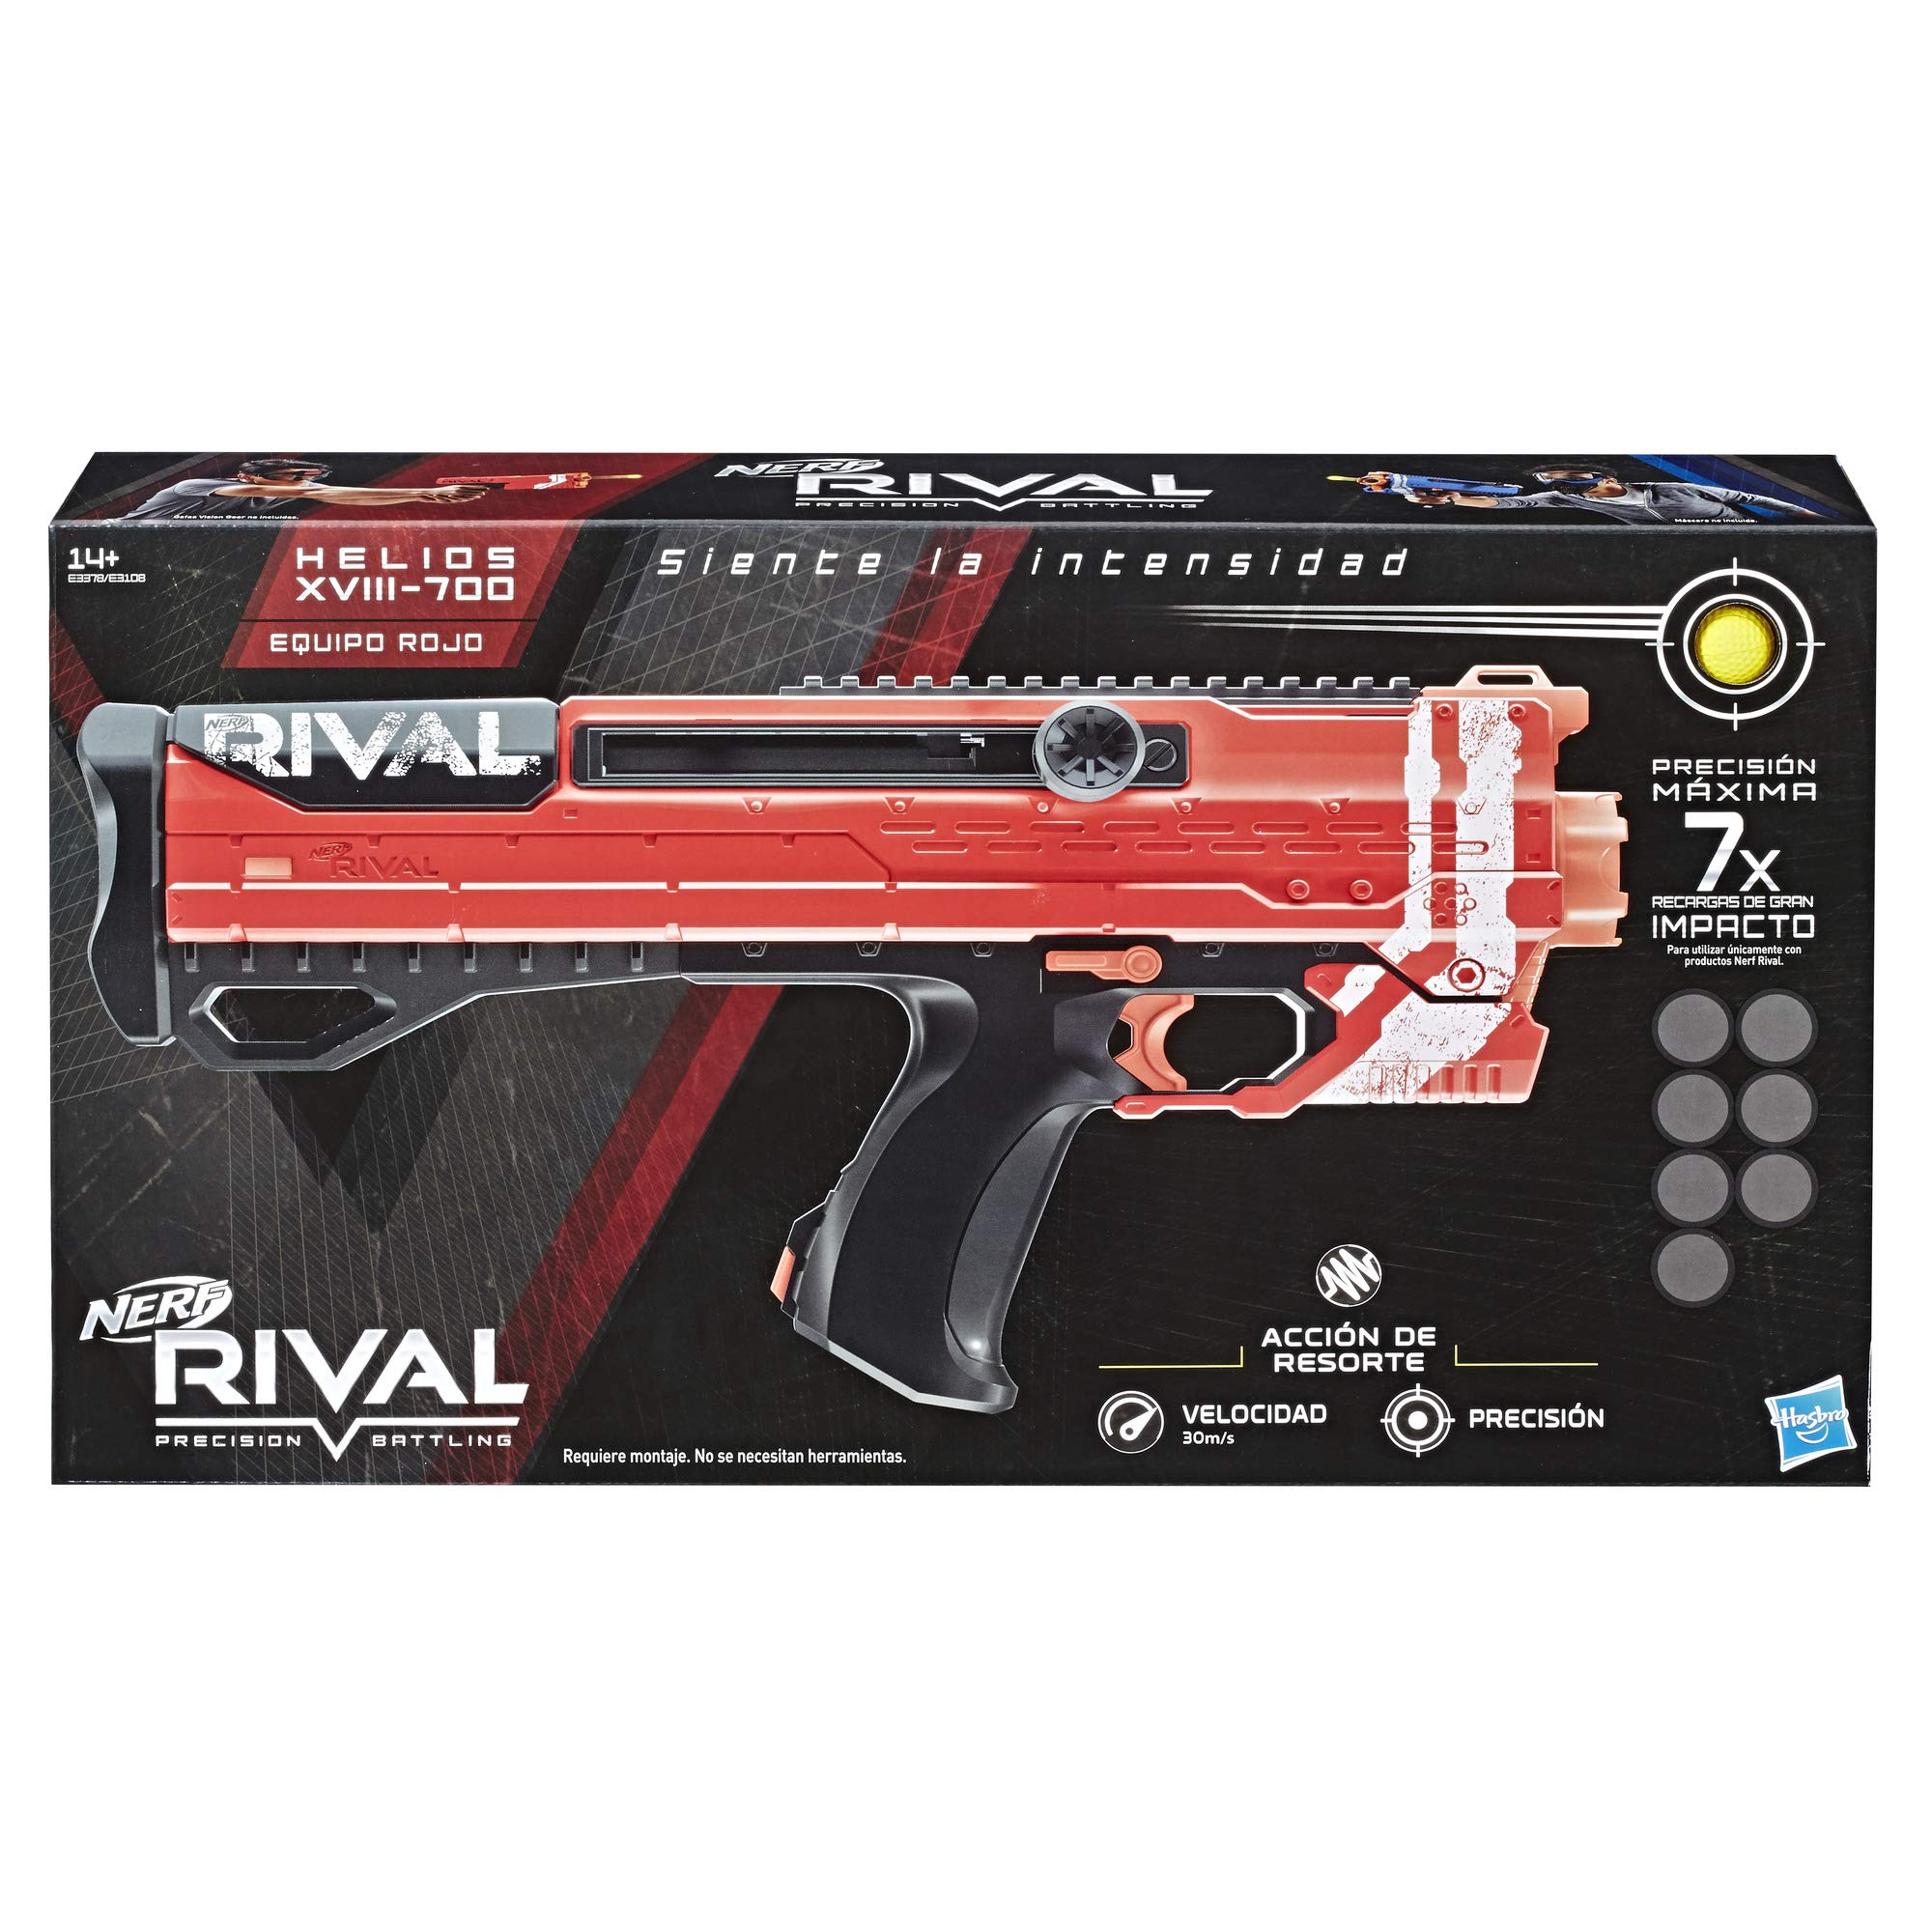 NERF Ner Rival Helios XVIII 700 Red